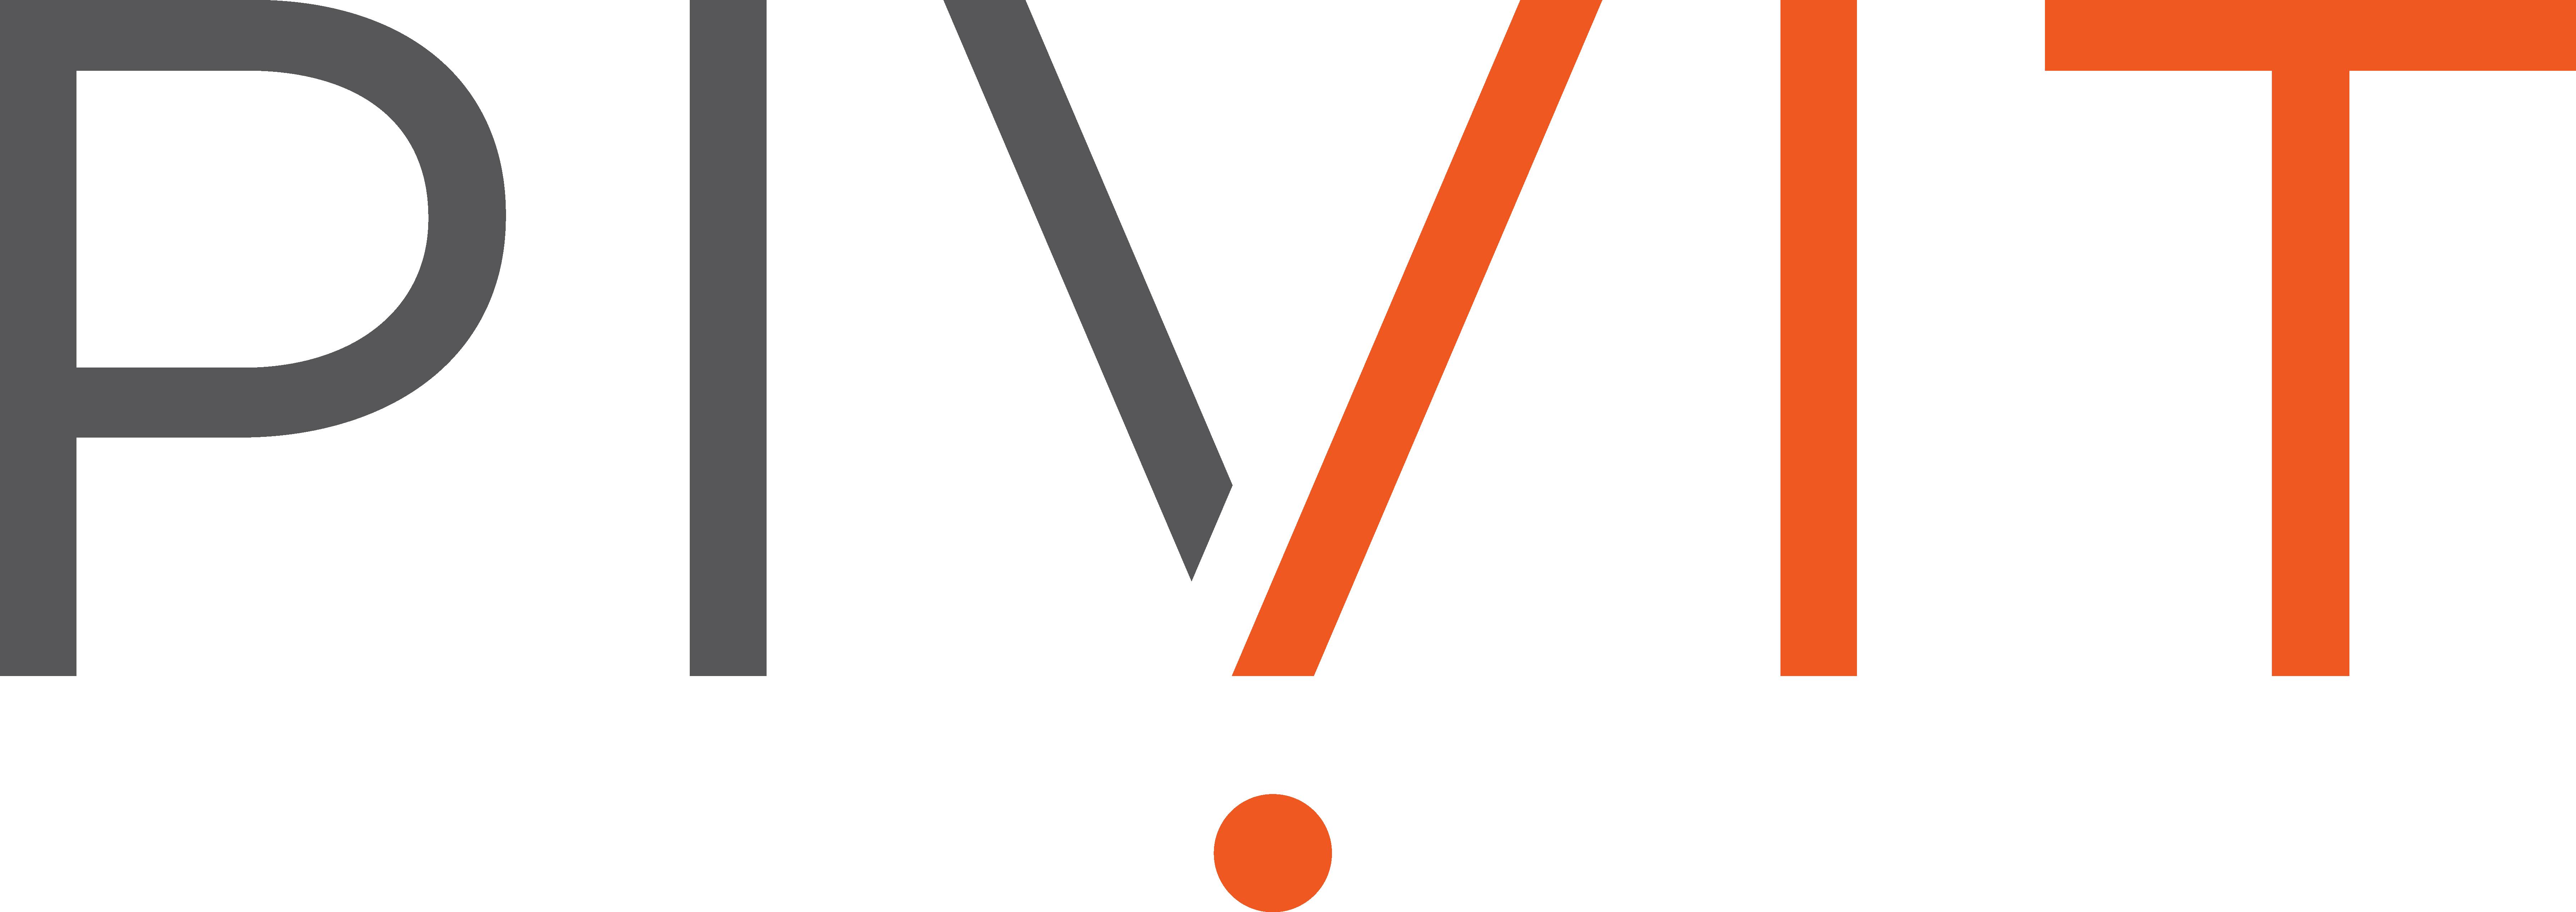 pivit-global-data-center-infrastructure